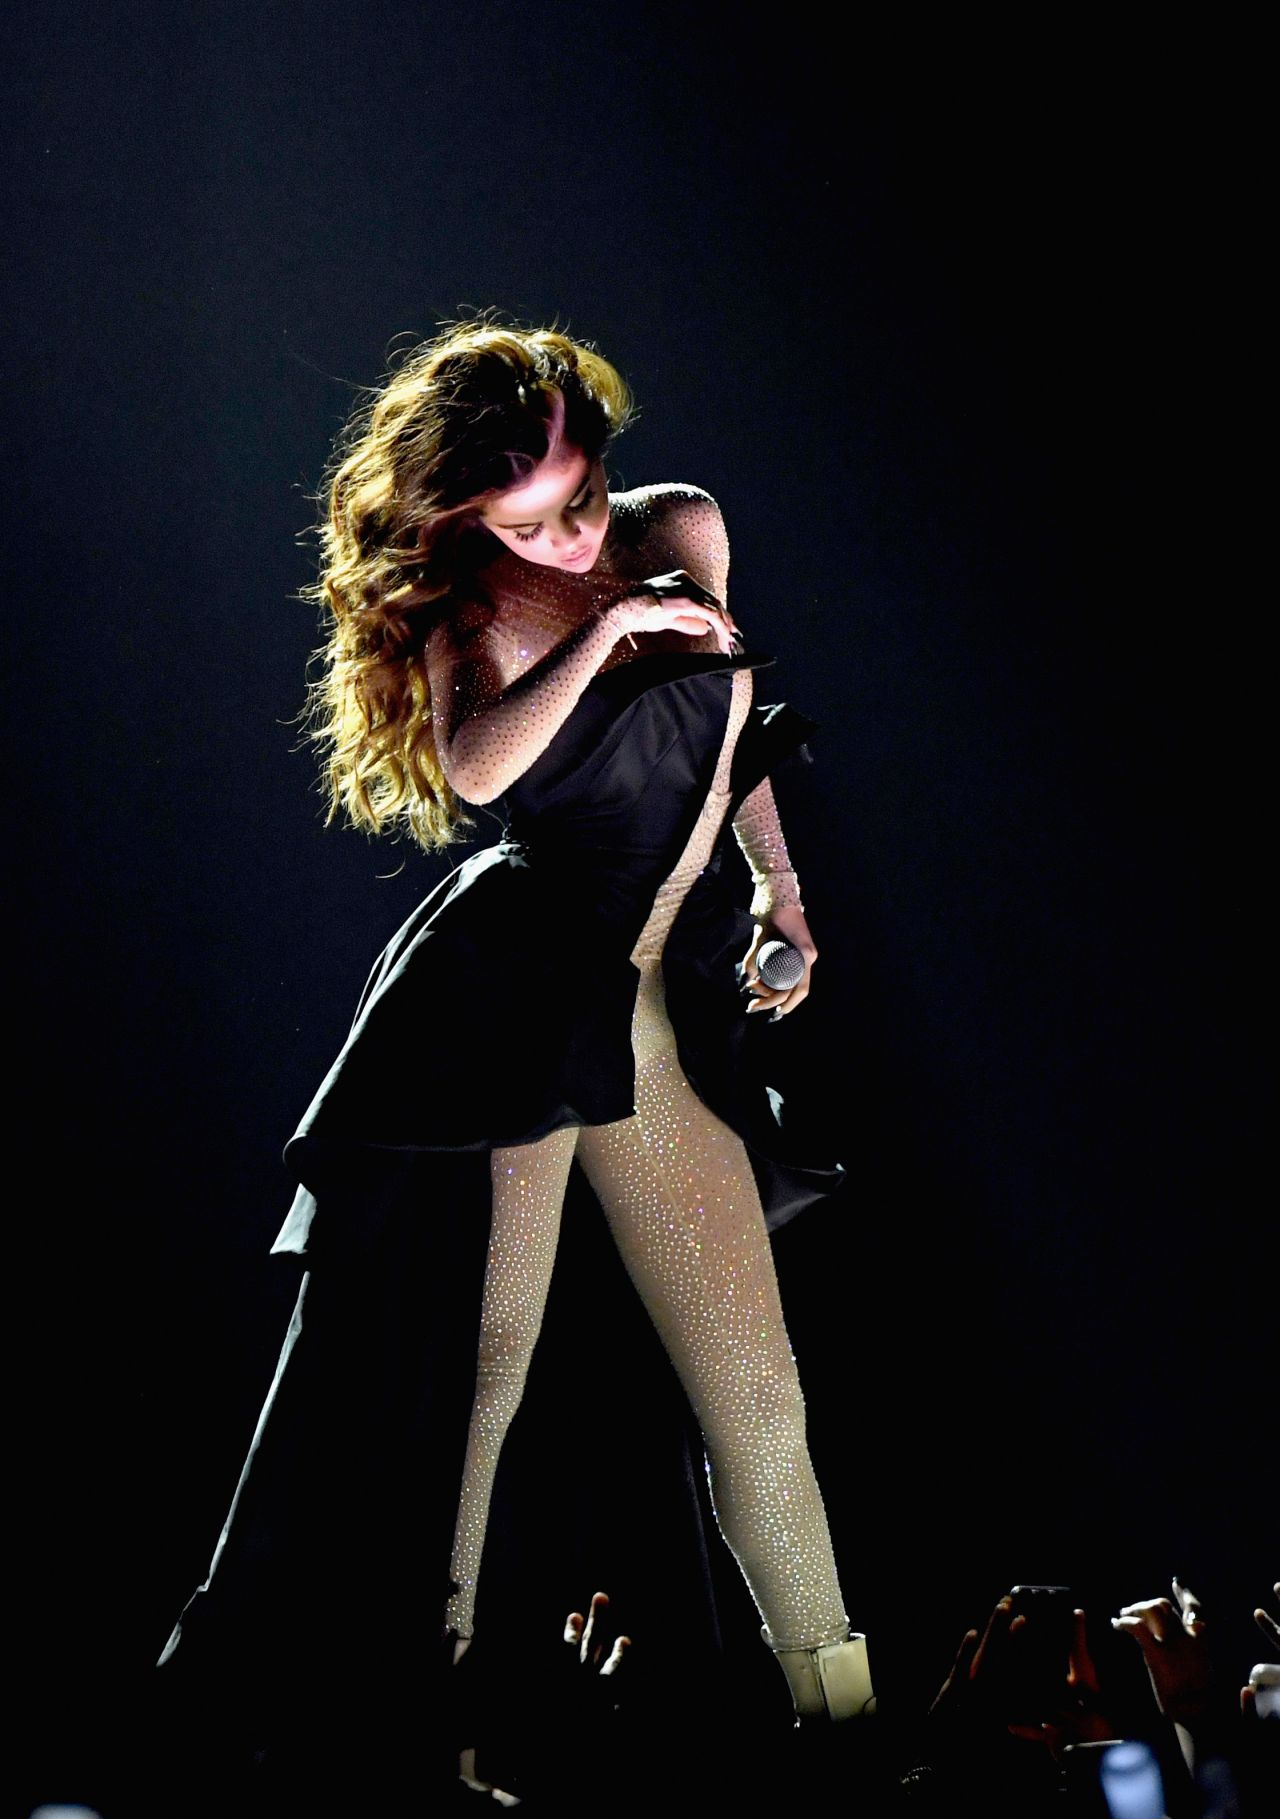 Selena Gomez Performing At The Revival World Tour At